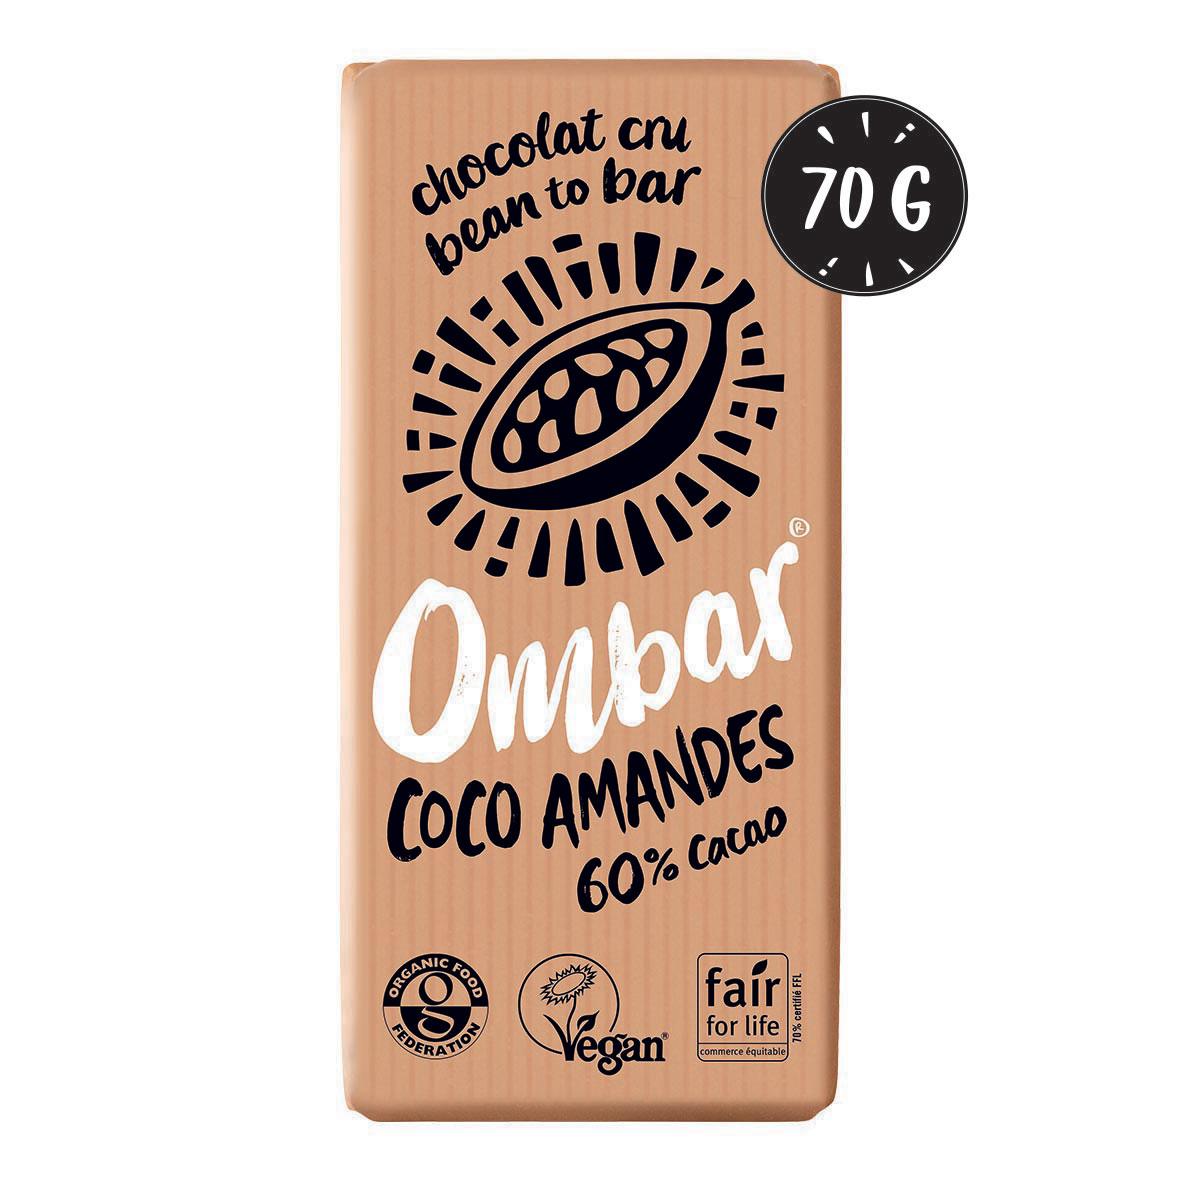 Ombar - Chocolat Cru Coco - Eclats d'Amandes 70g Bio